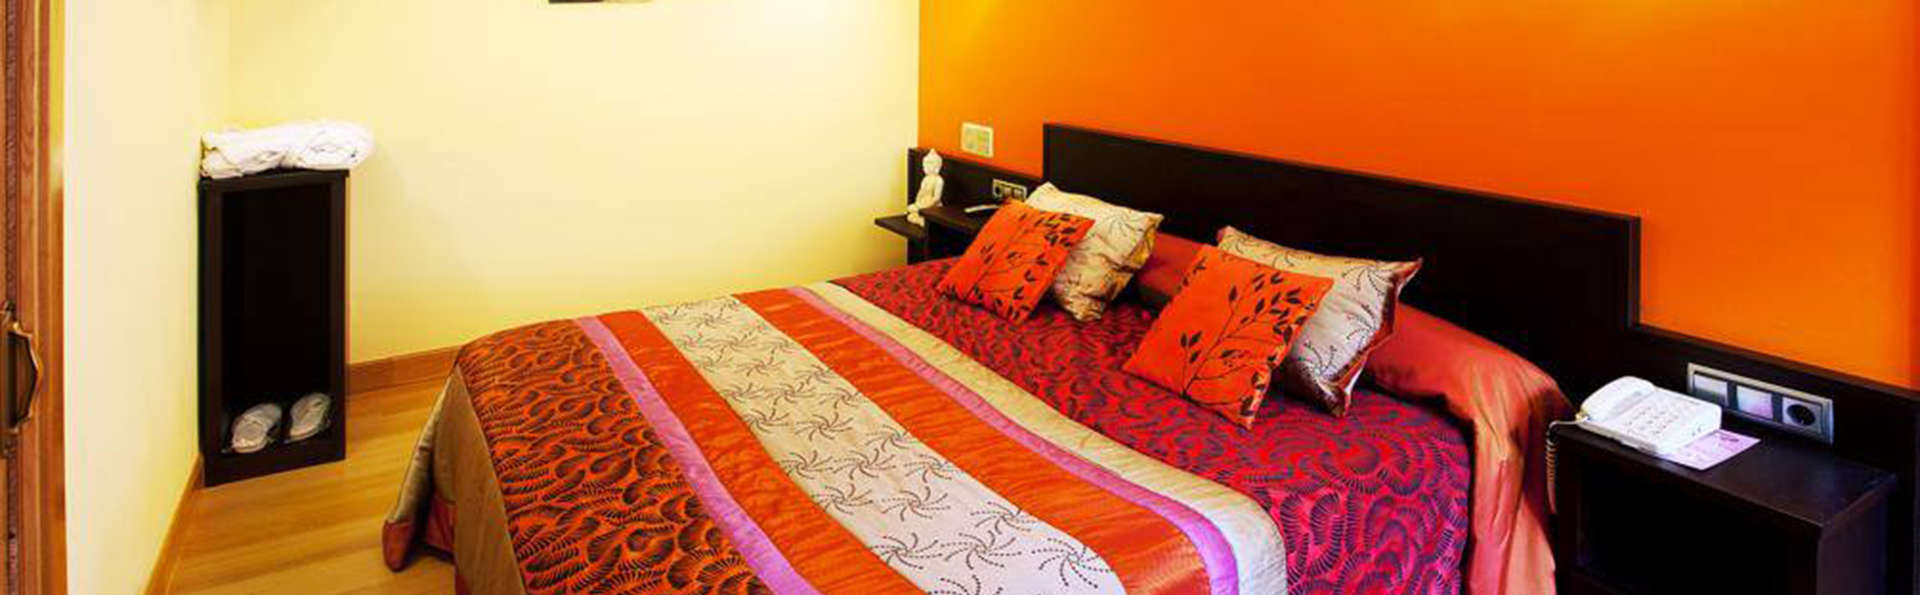 Hotel Venta de Etxalar - EDIT_room4.jpg